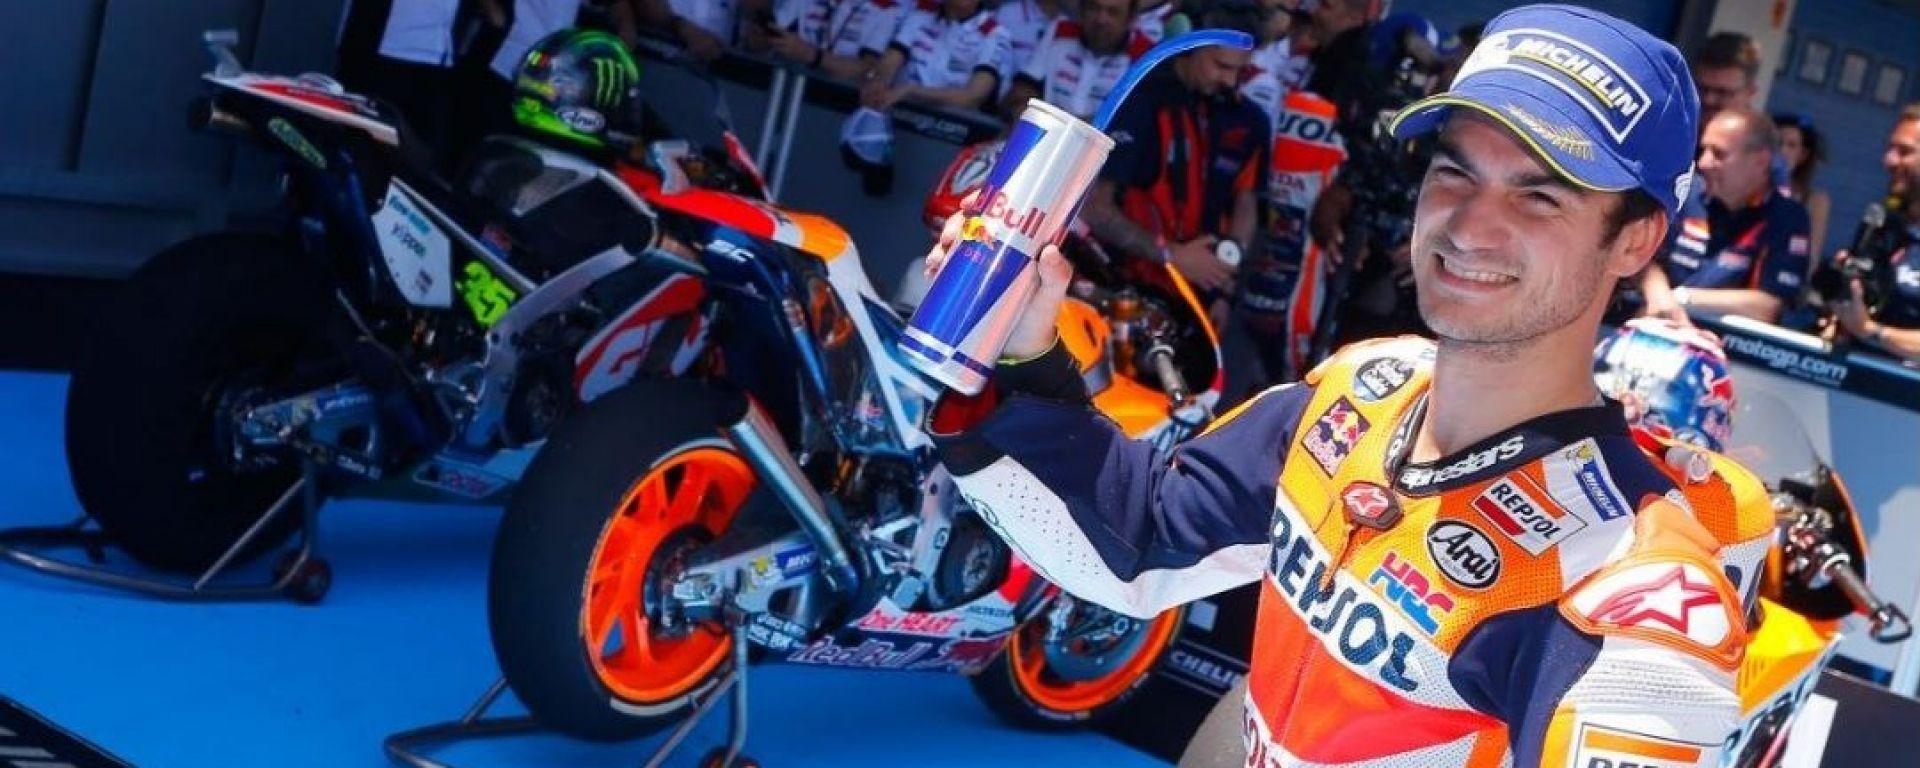 MotoGP Jerez 2017, Daniel Pedrosa